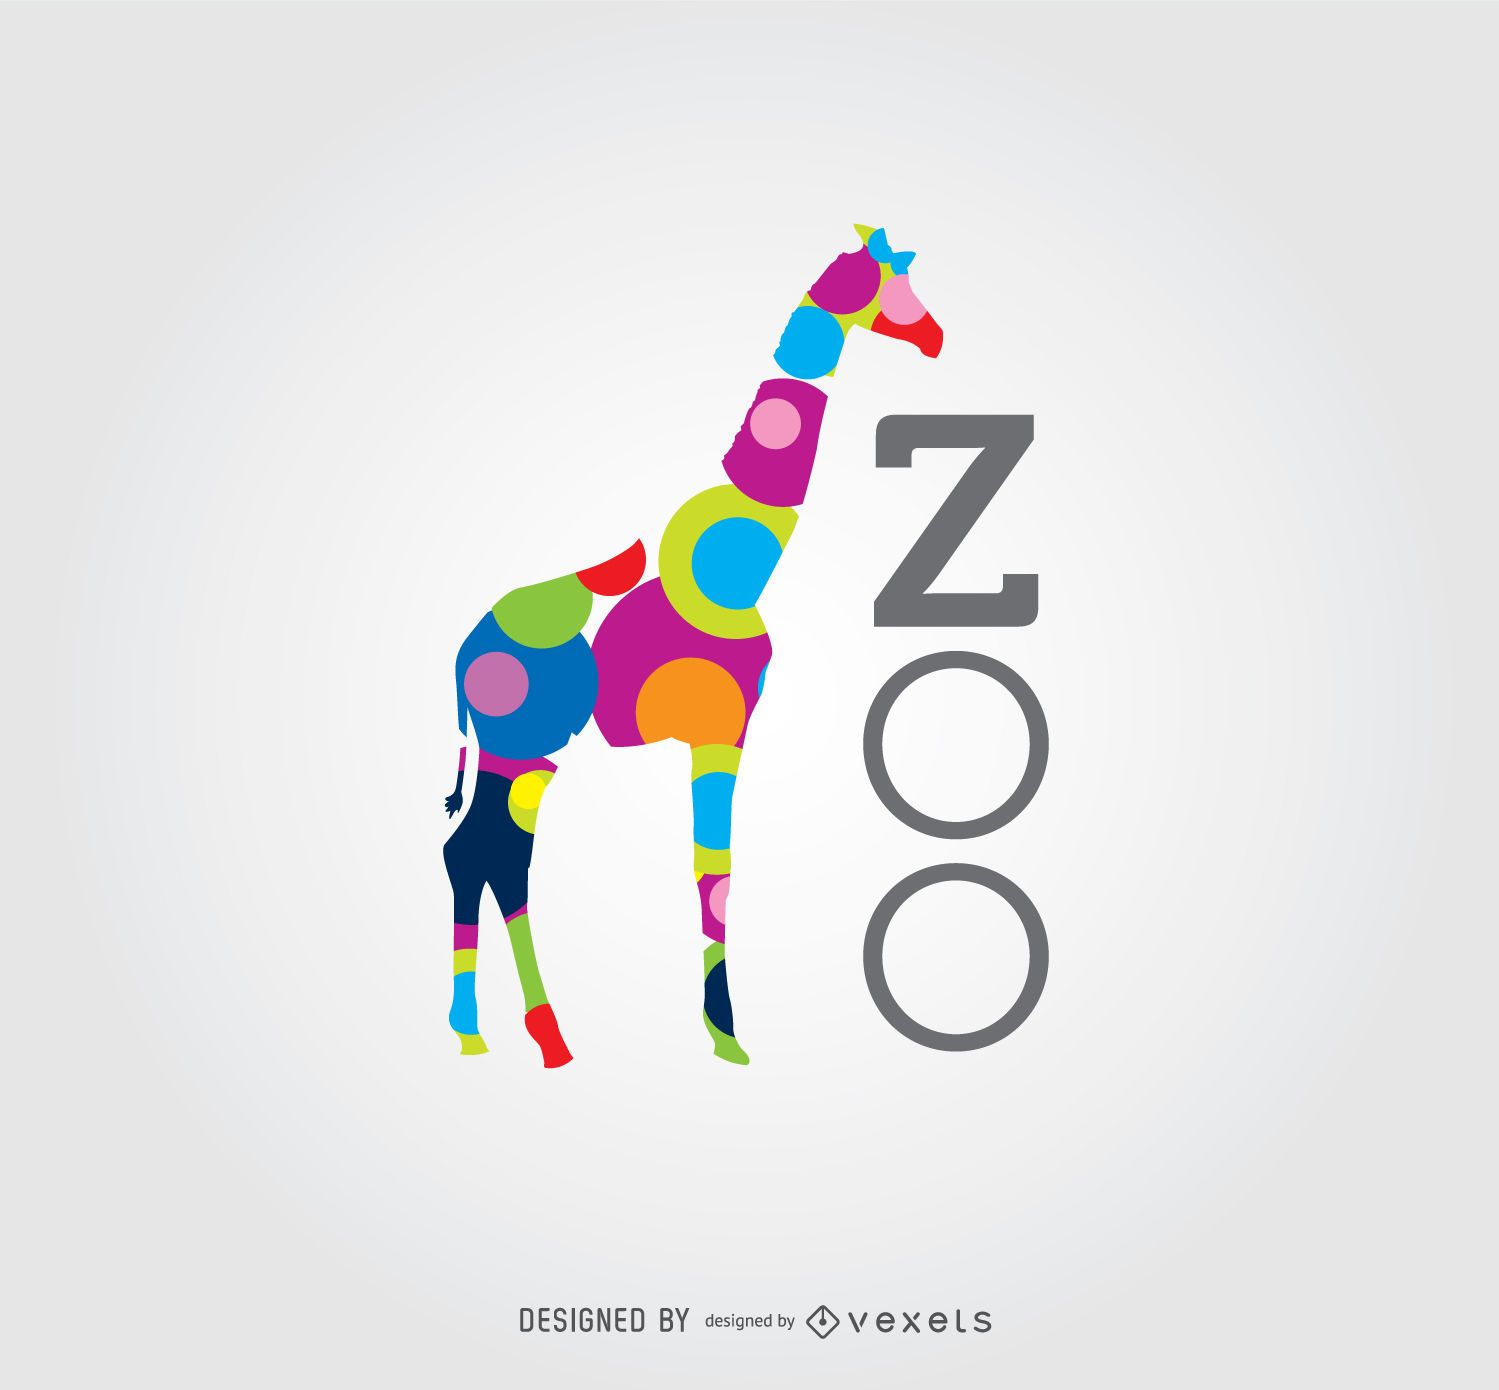 Colored Circles Giraffe Zoo Logo